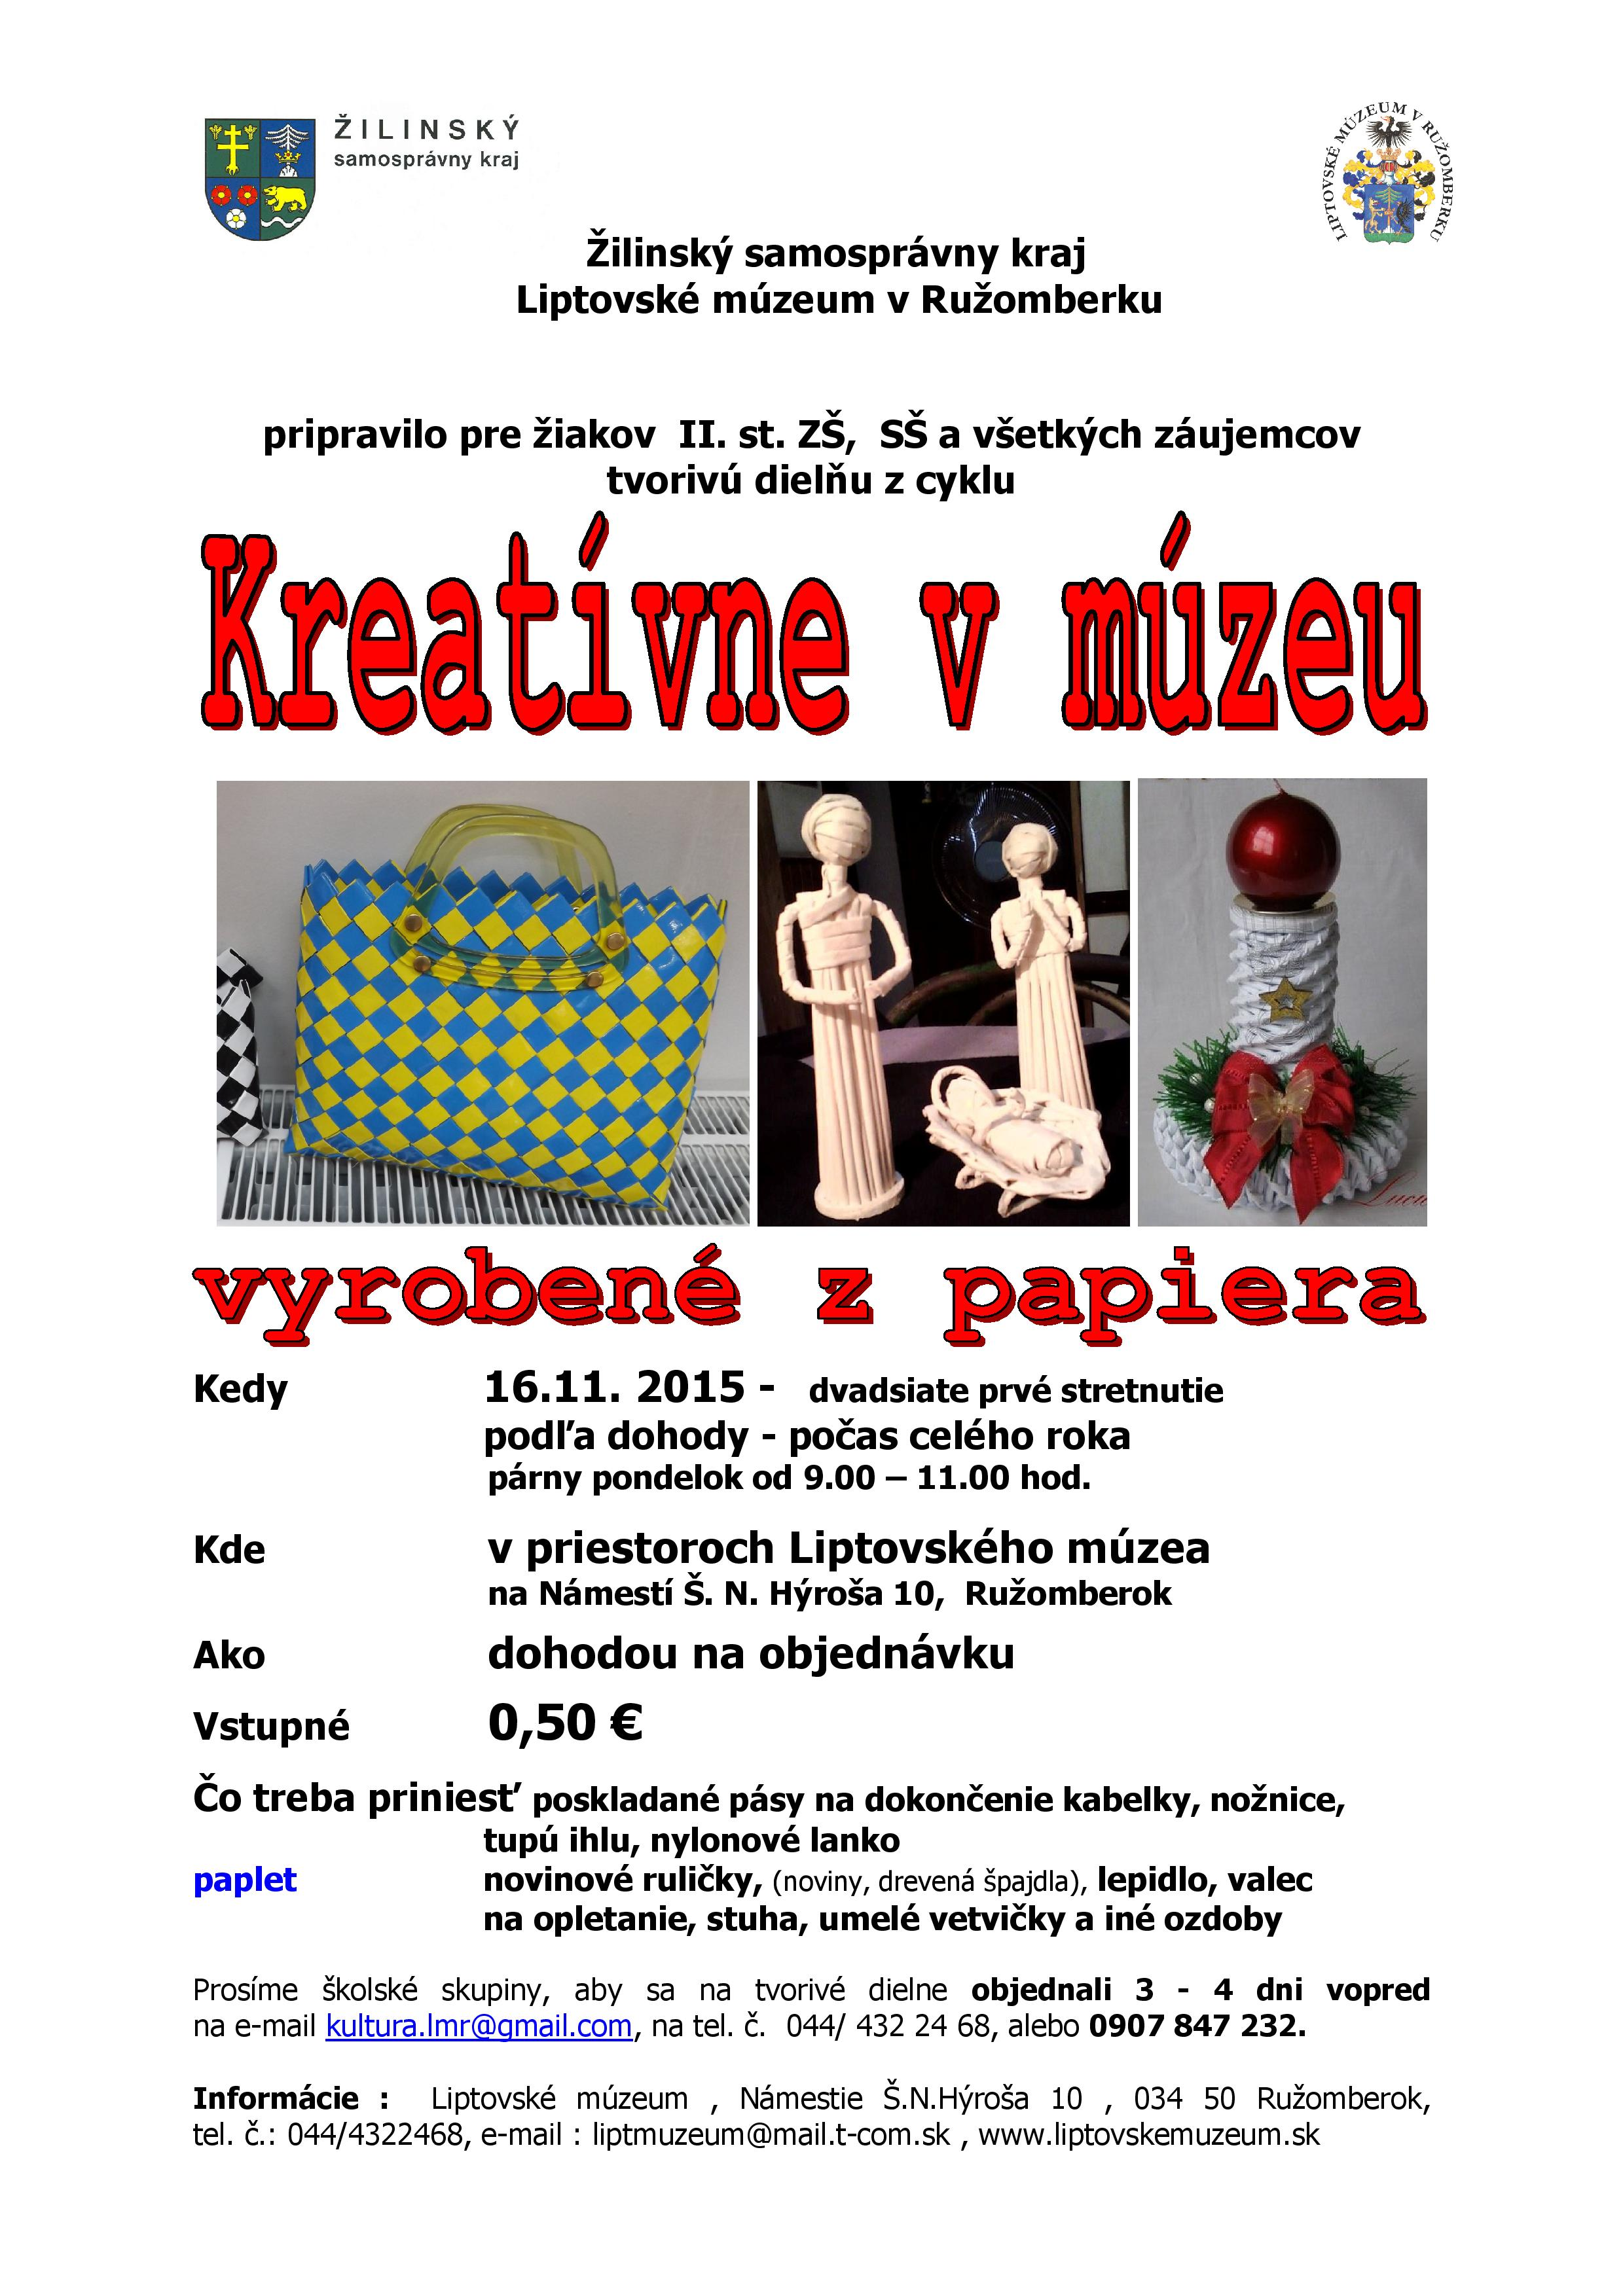 kvm-vyrobene-z-papiera-16-11-15-plagat